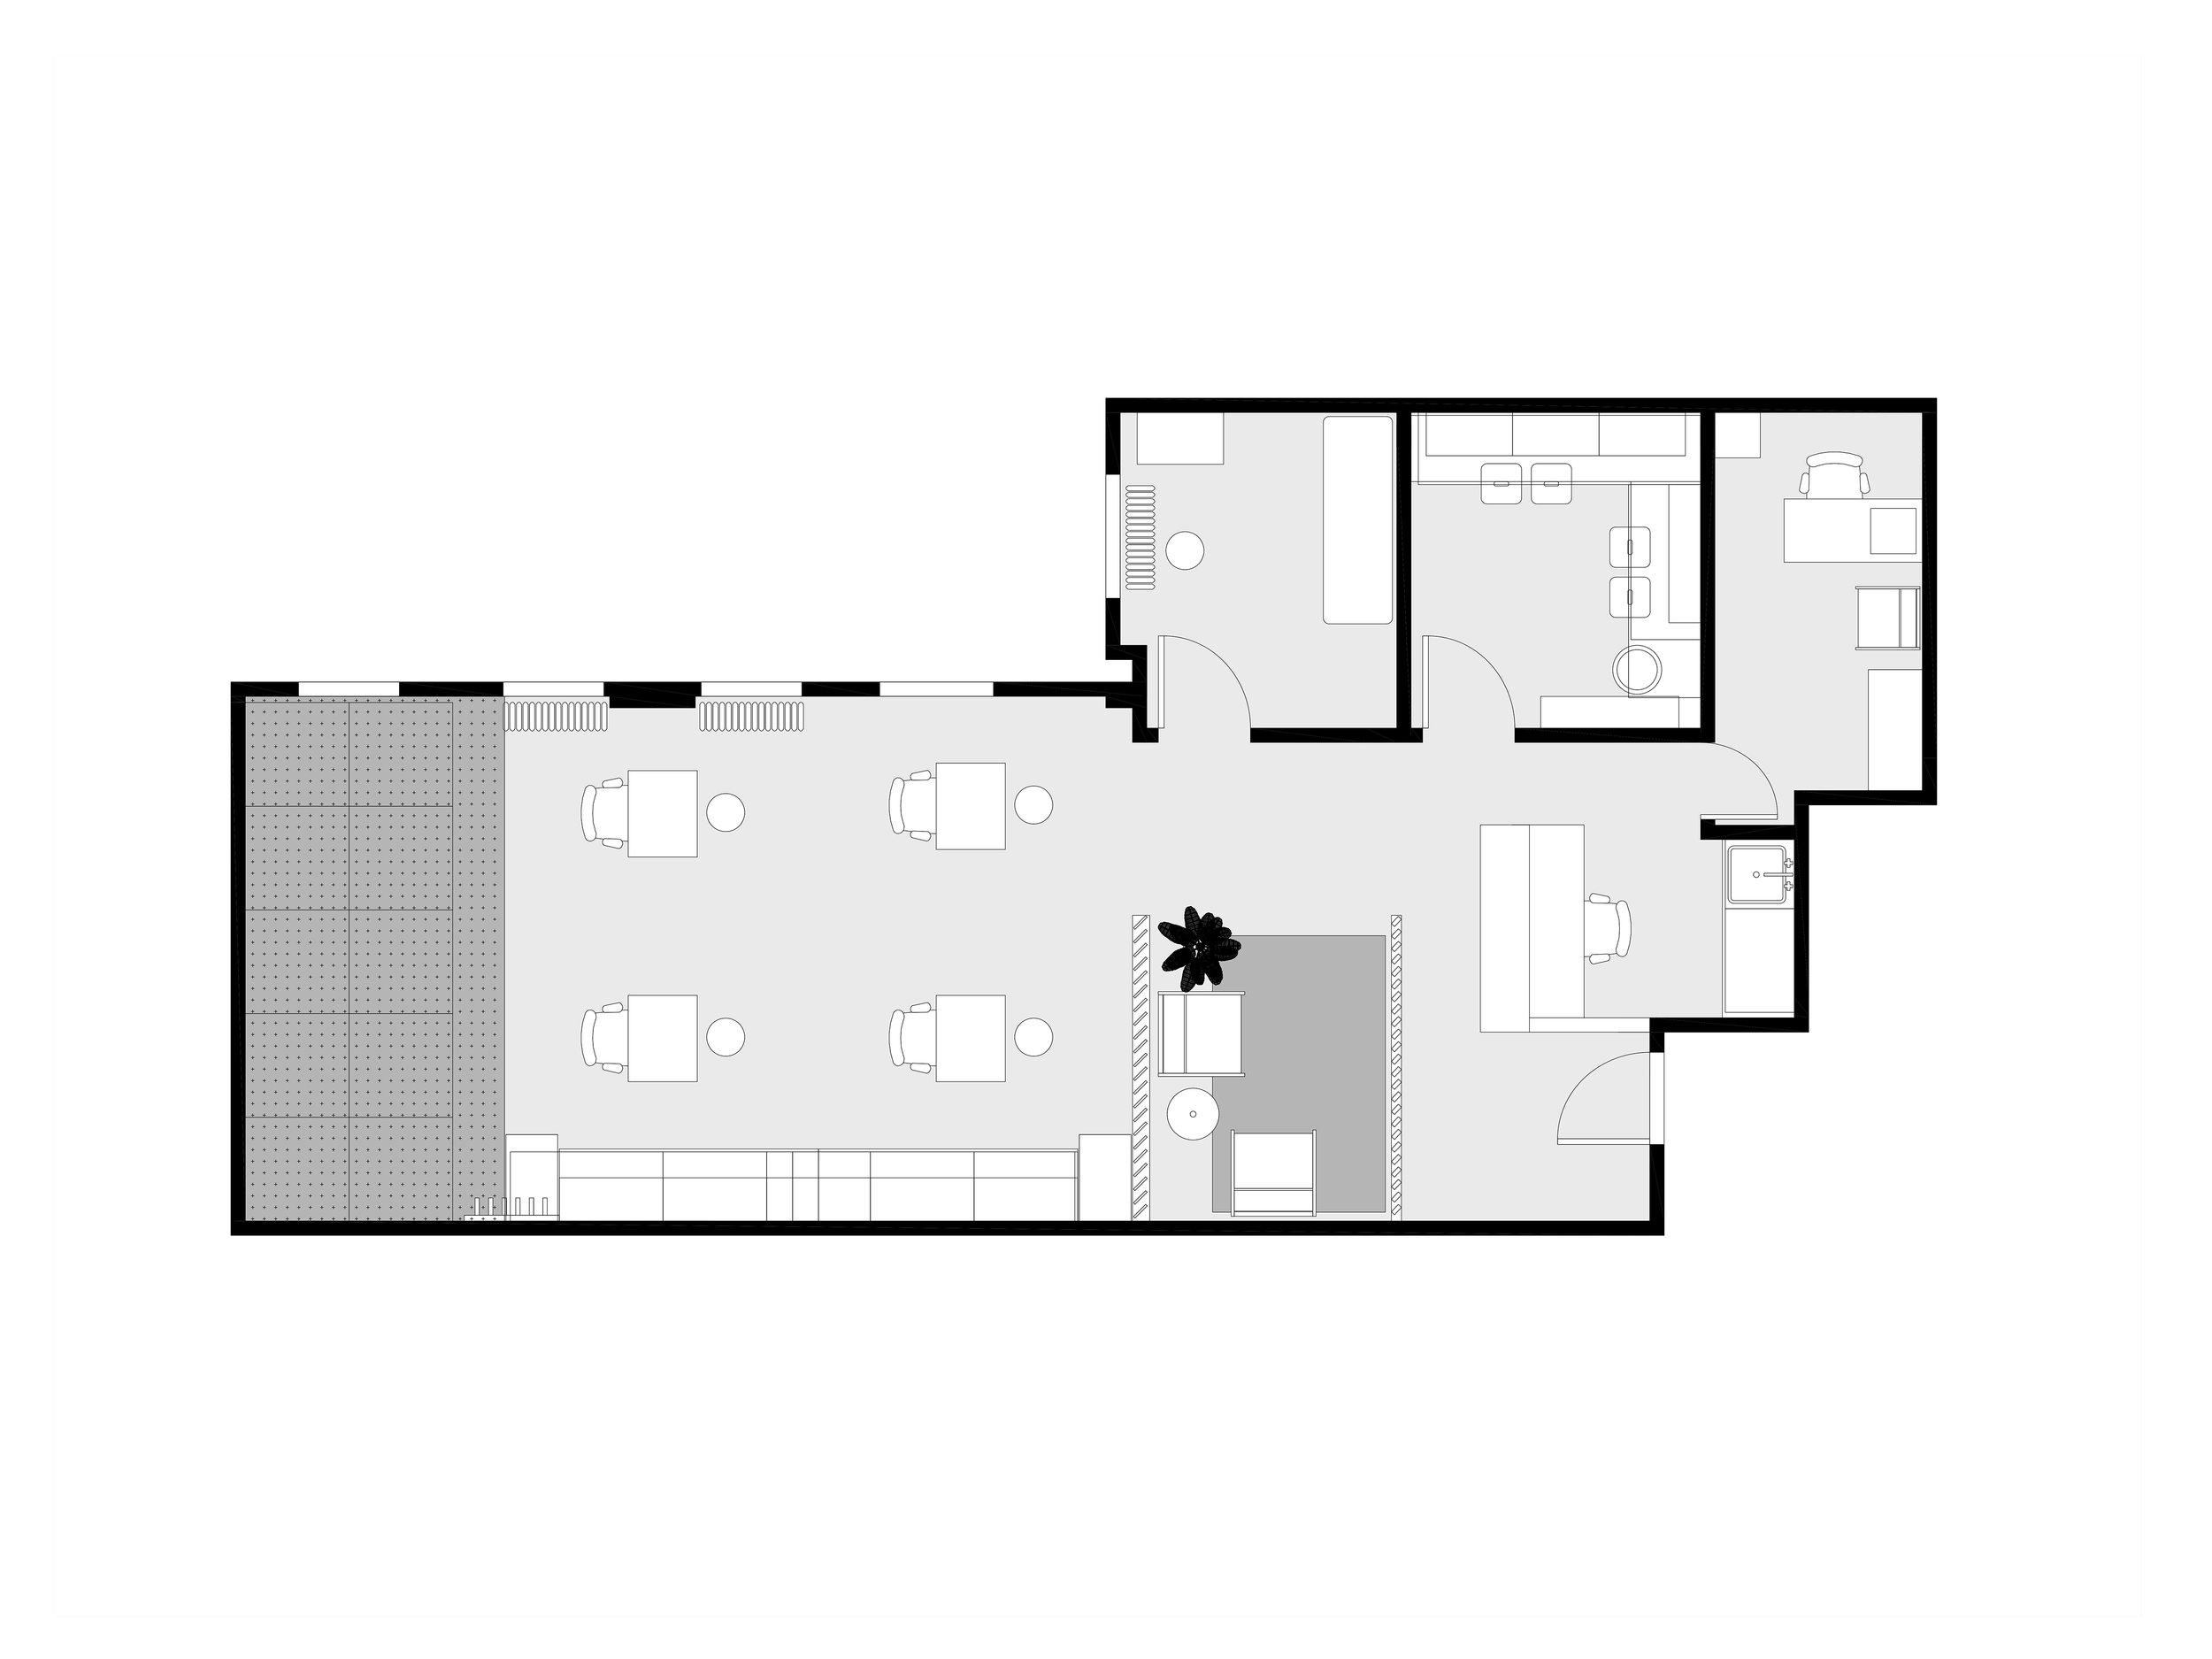 HANDTHERAPY_OFFICE REFRESH PLANS_070918.jpg